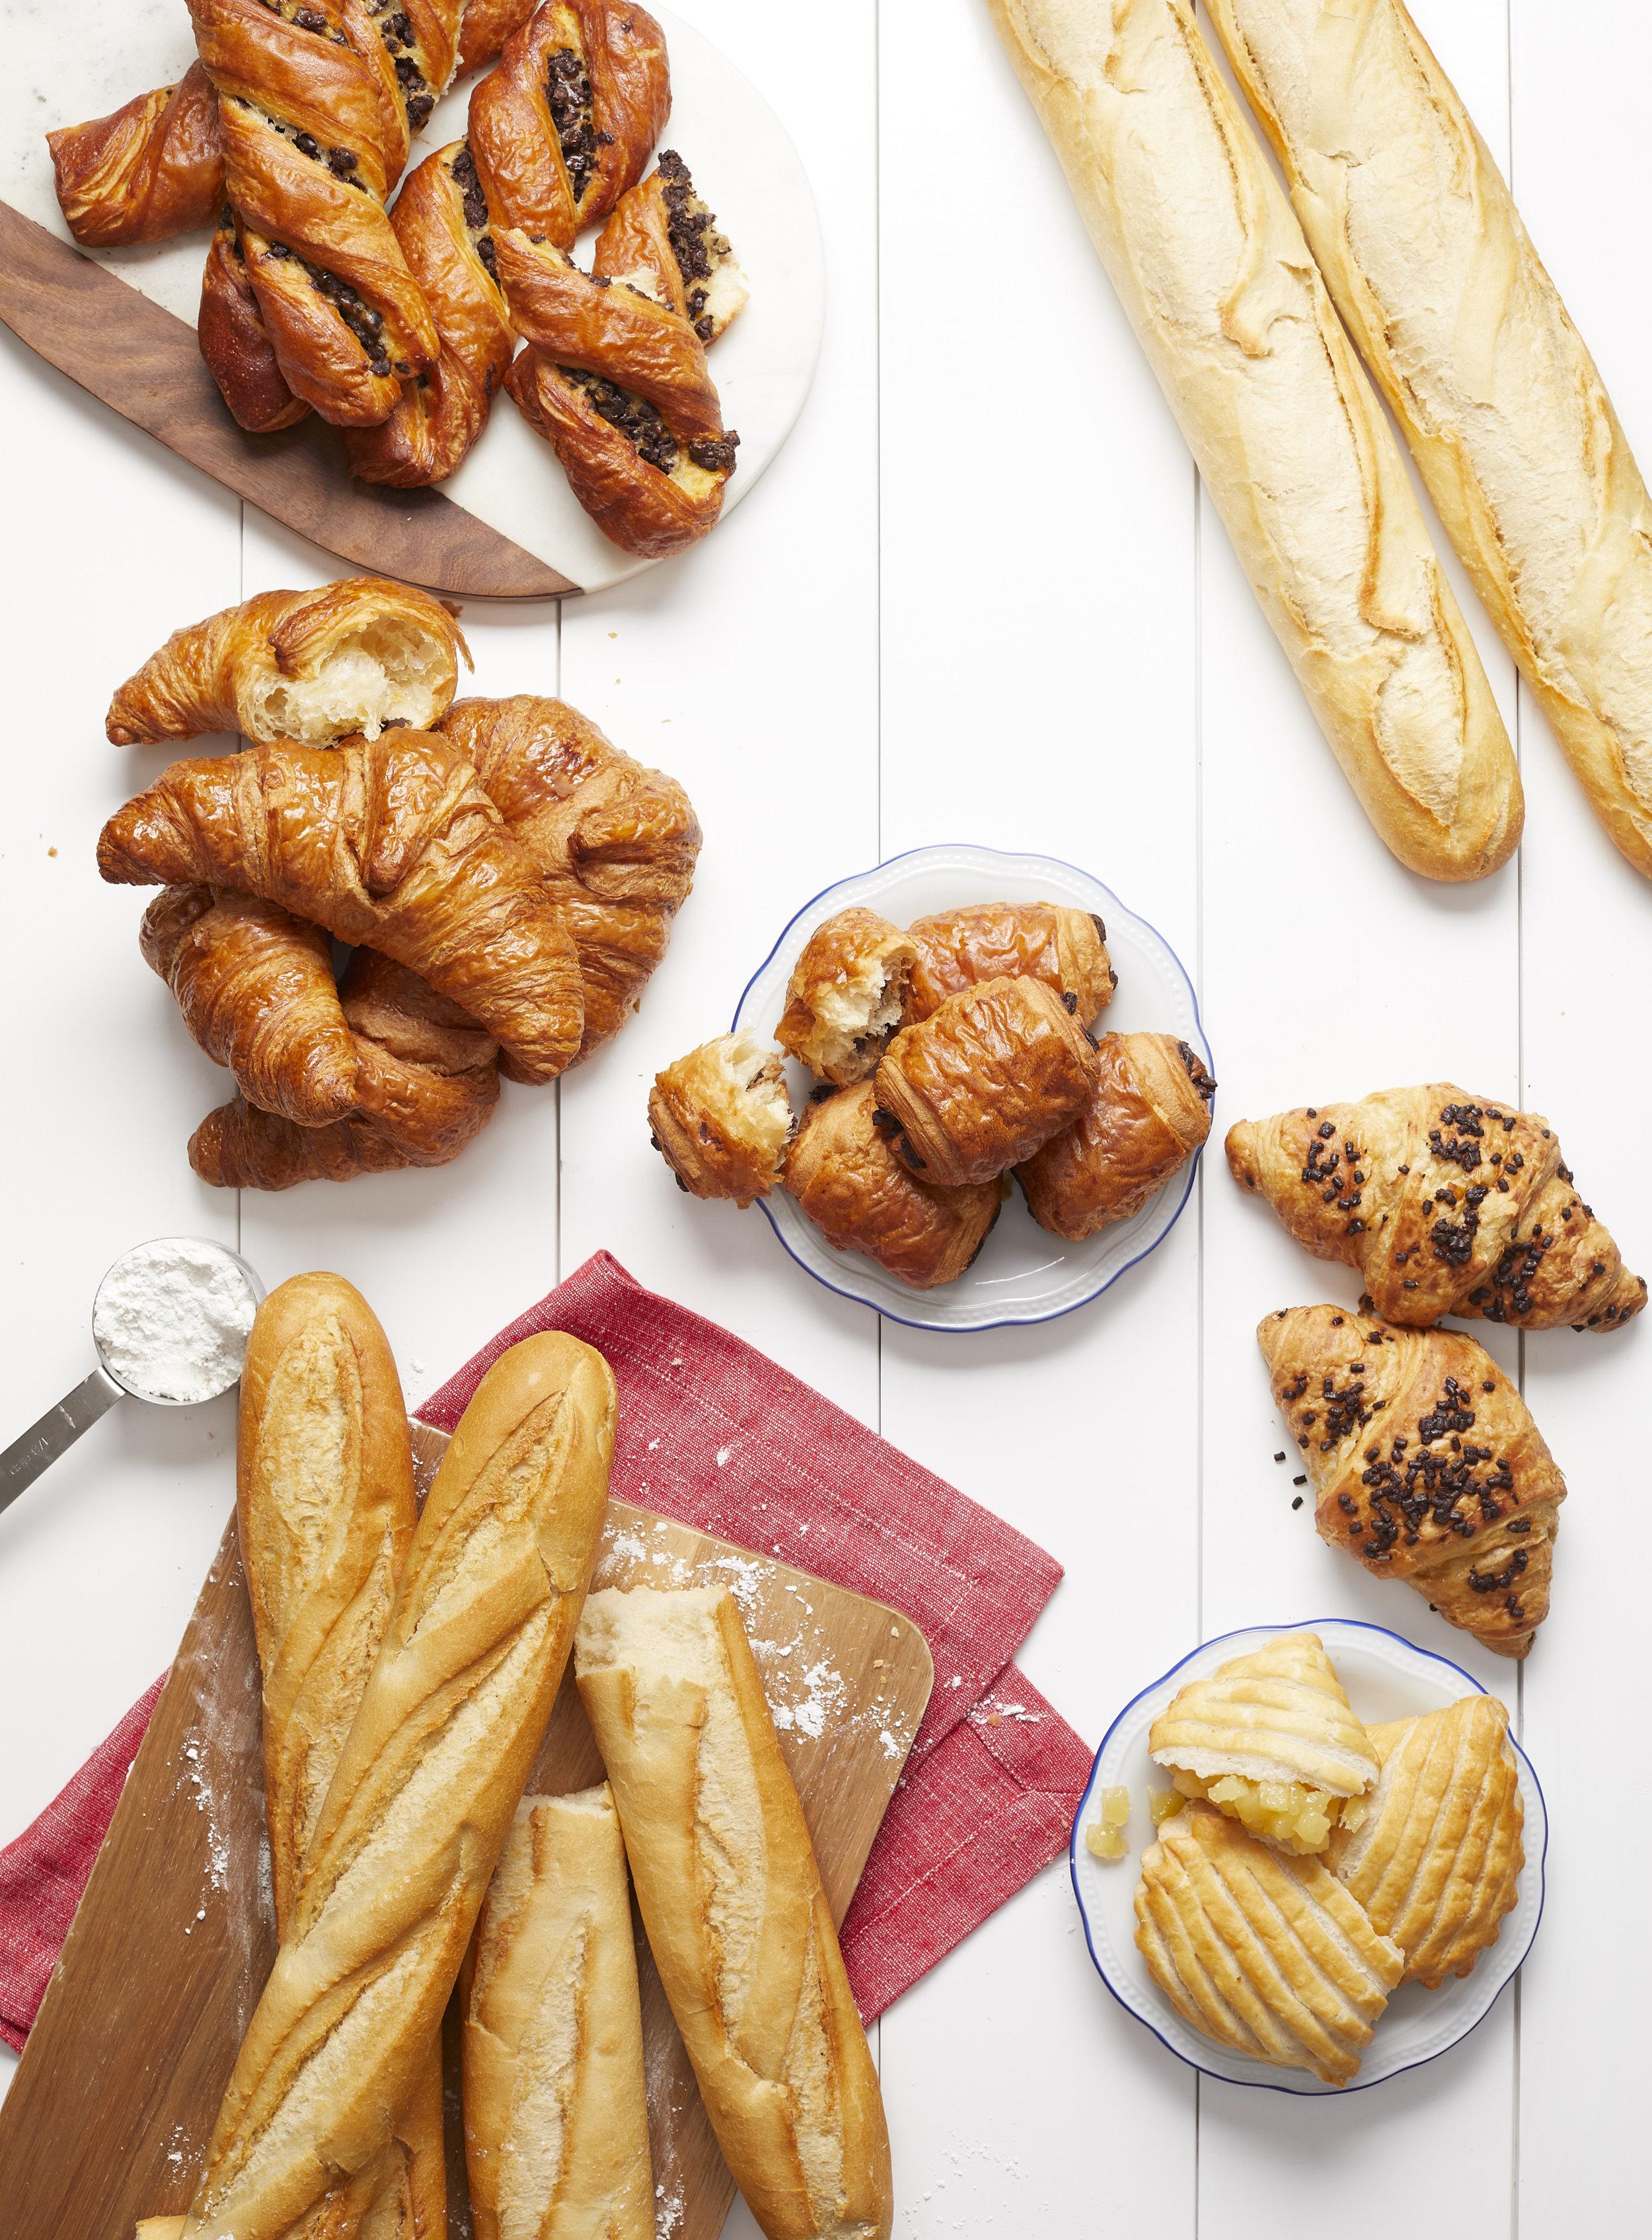 p=214231_214949_206613_214940_200101_200032_bakery.jpg